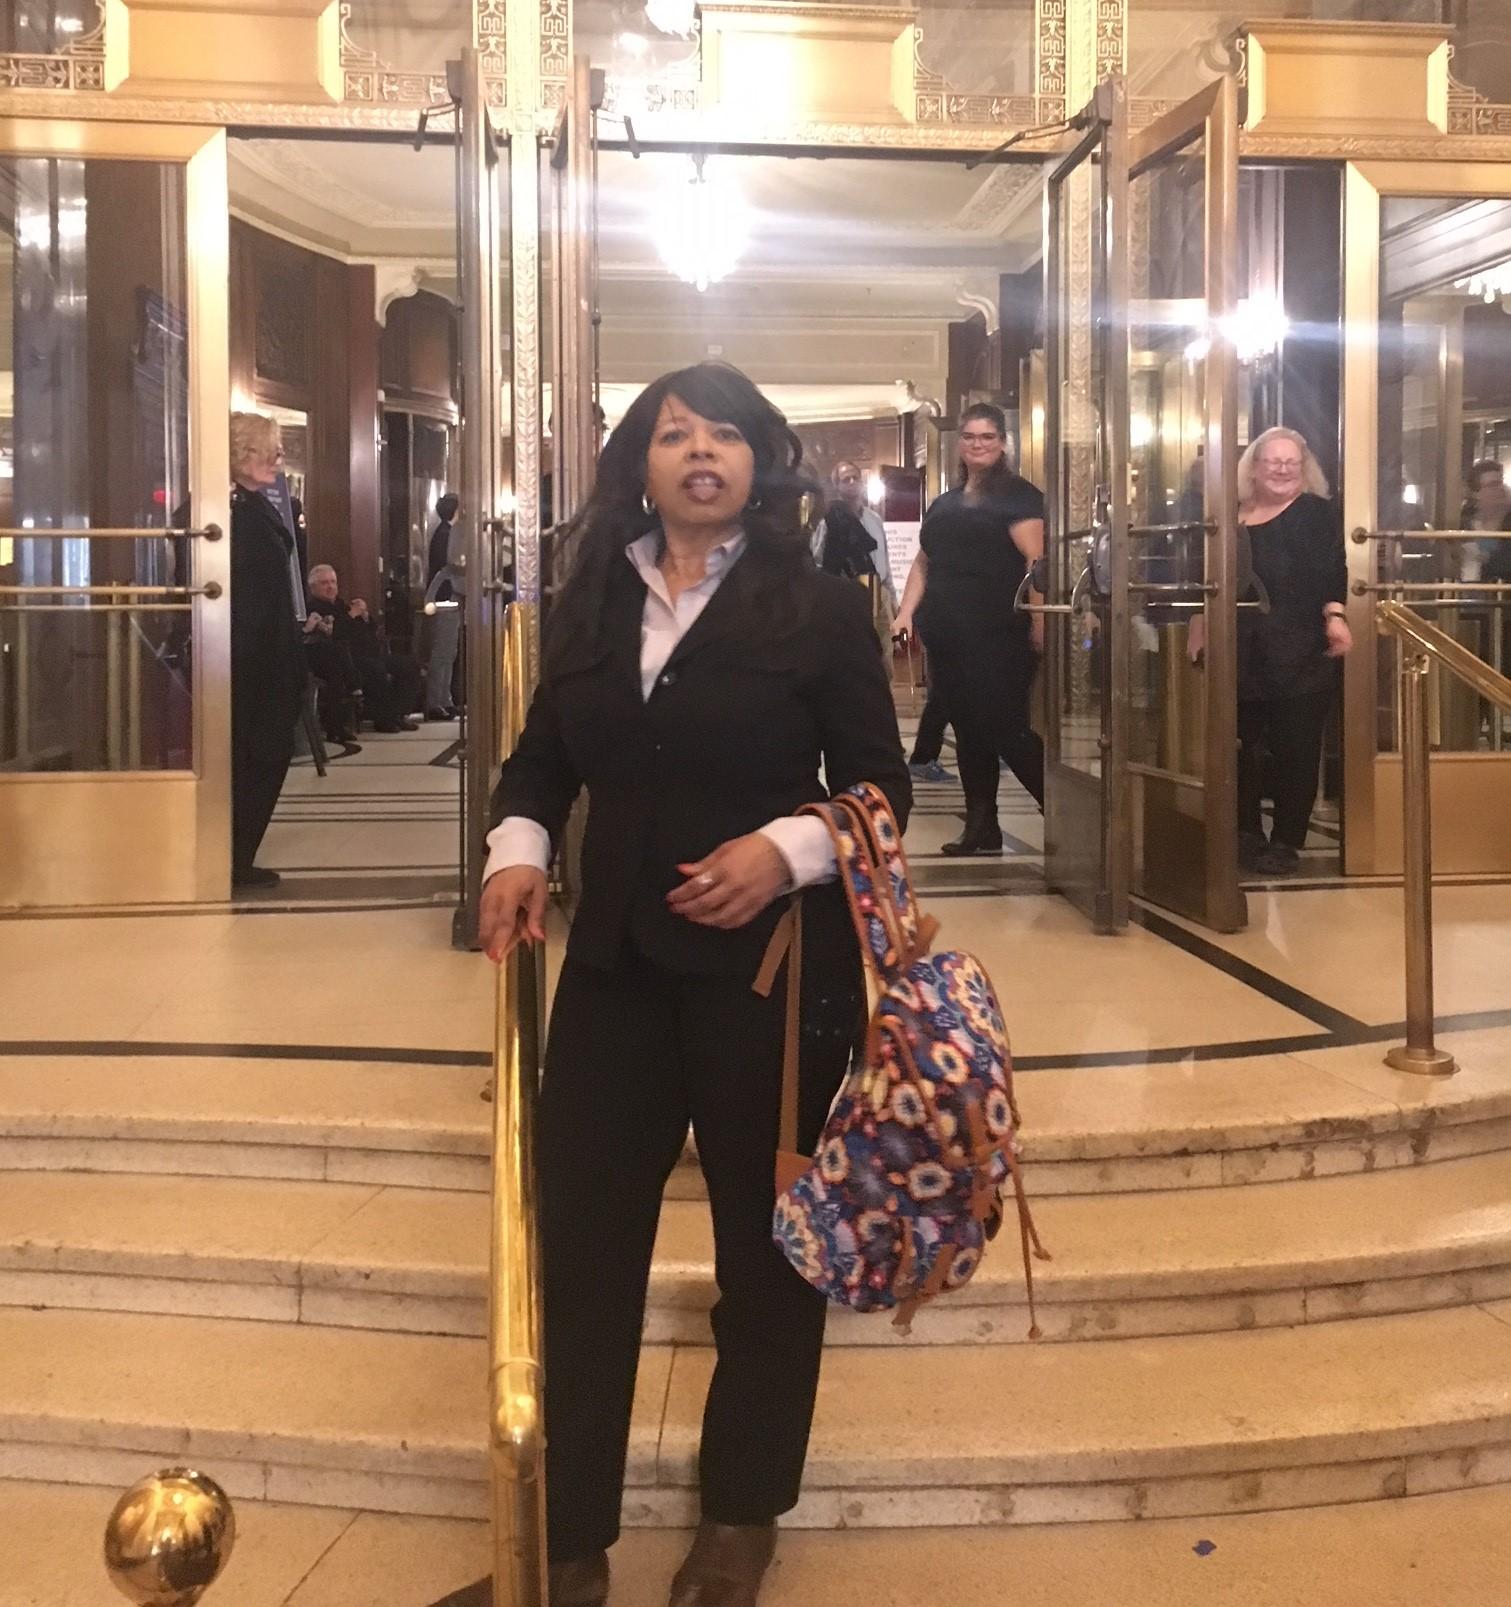 Cheryl Worrell Brown Boston Opera House 3.jpg